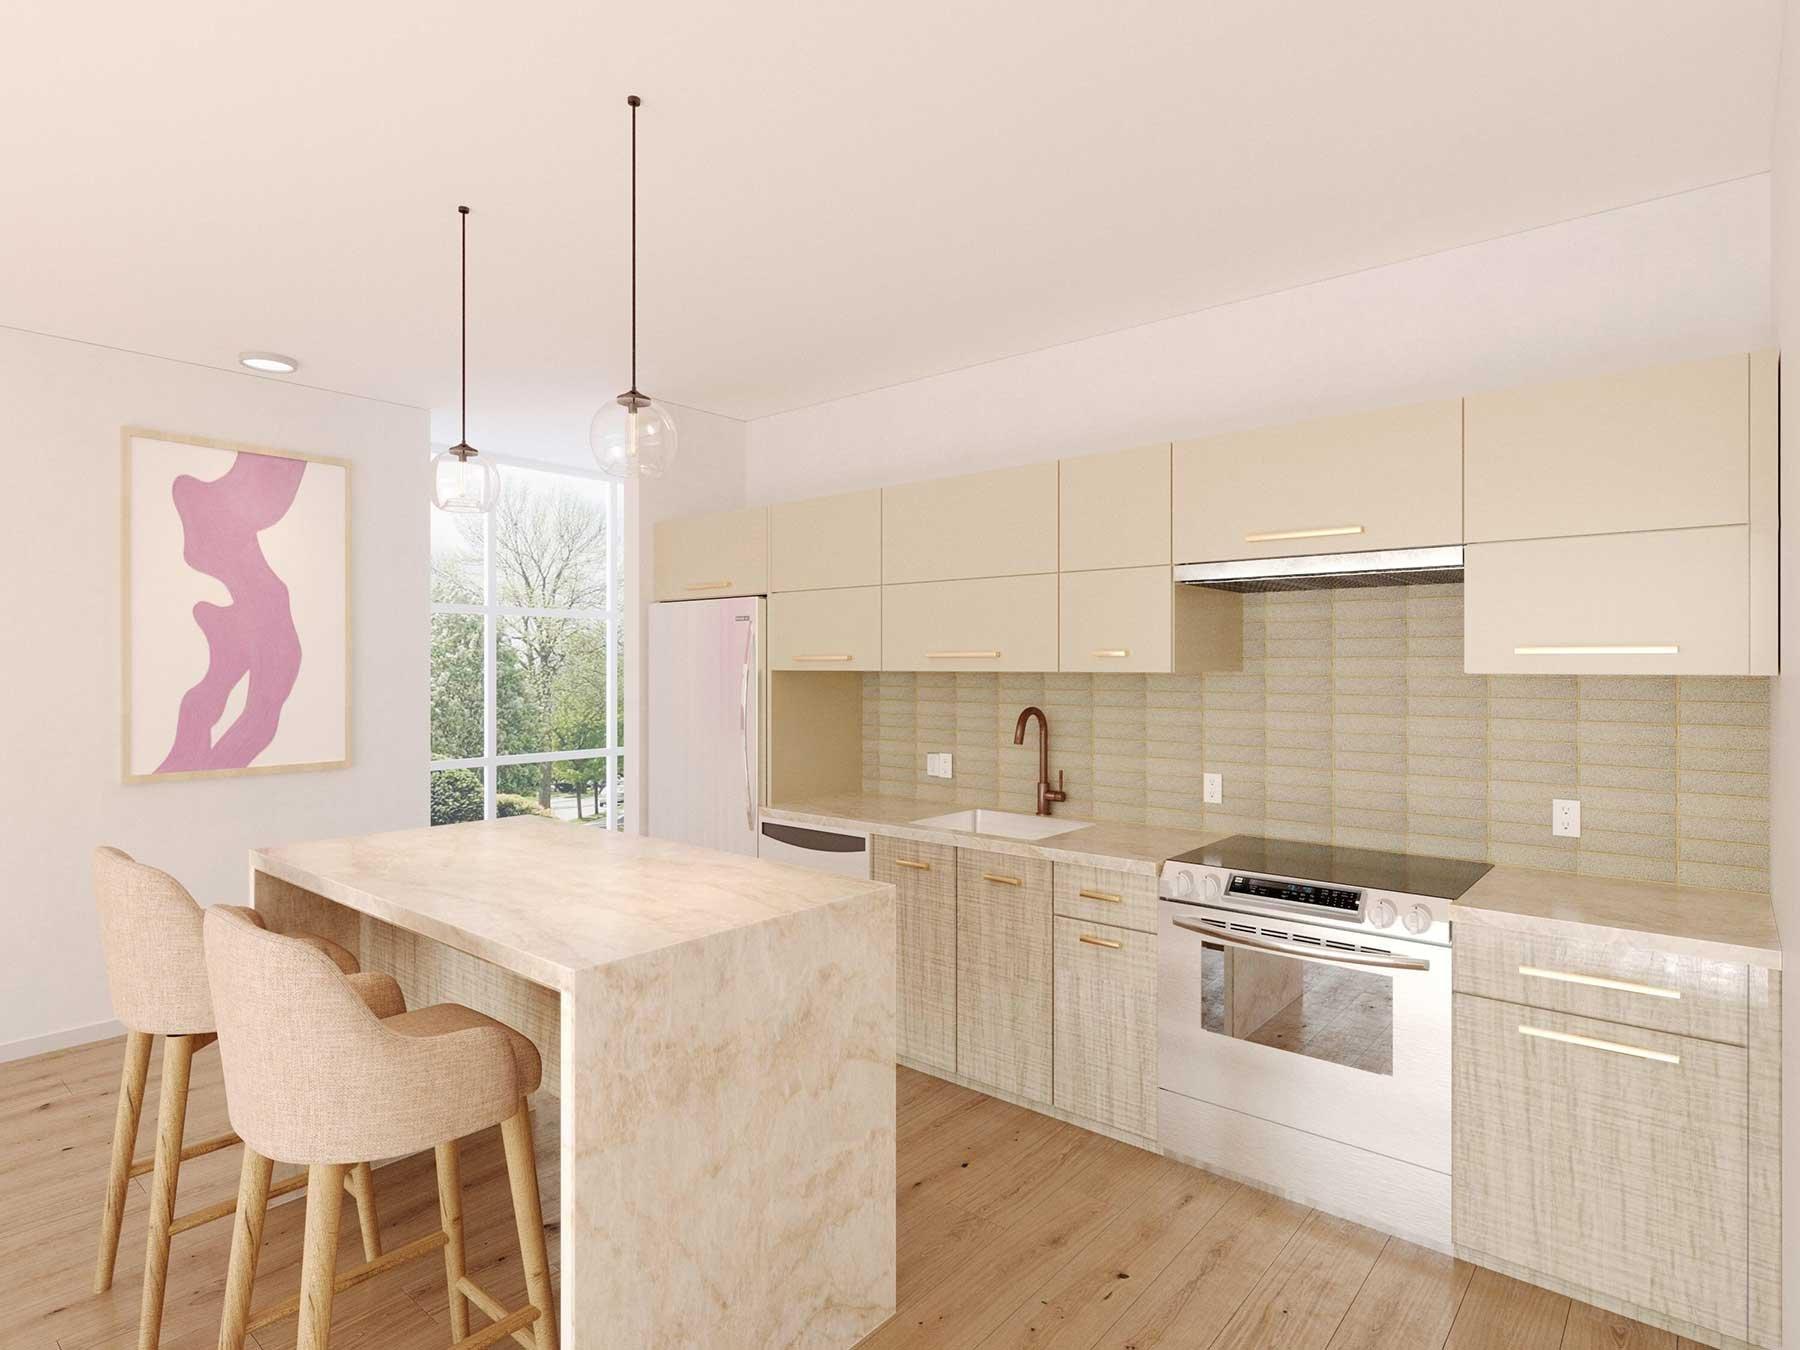 Design I West- Kitchen rendering